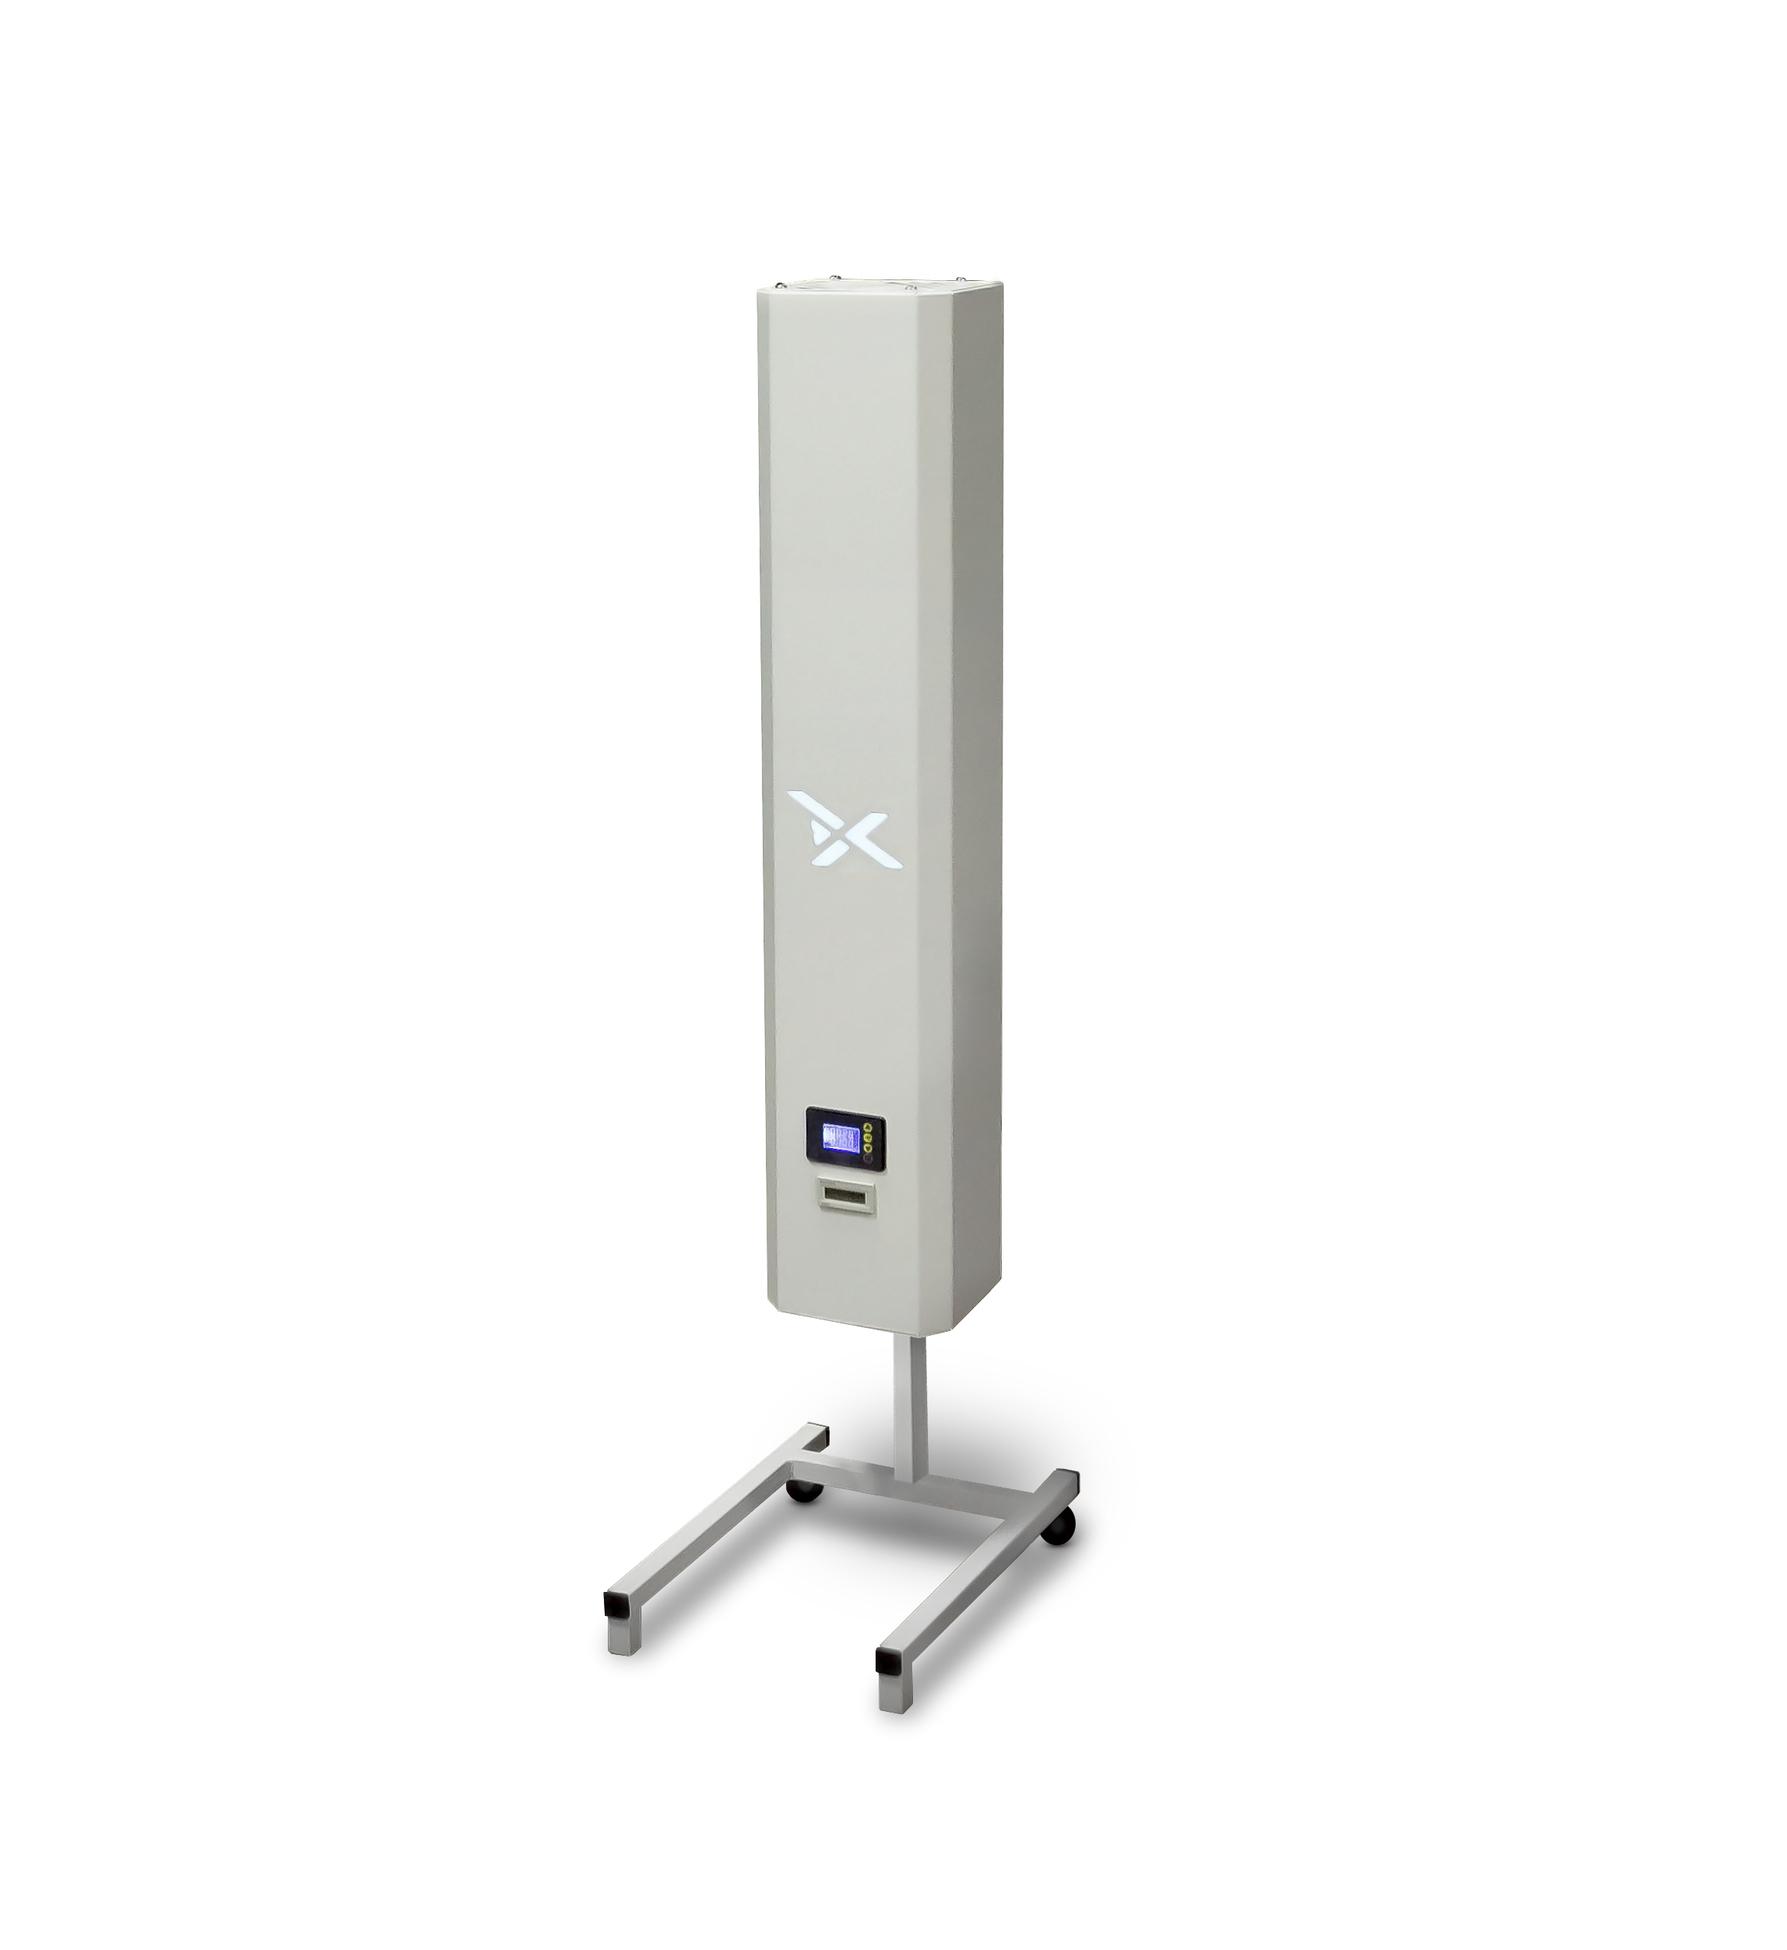 Бактерицидный рециркулятор воздуха Proto-RMK-15S